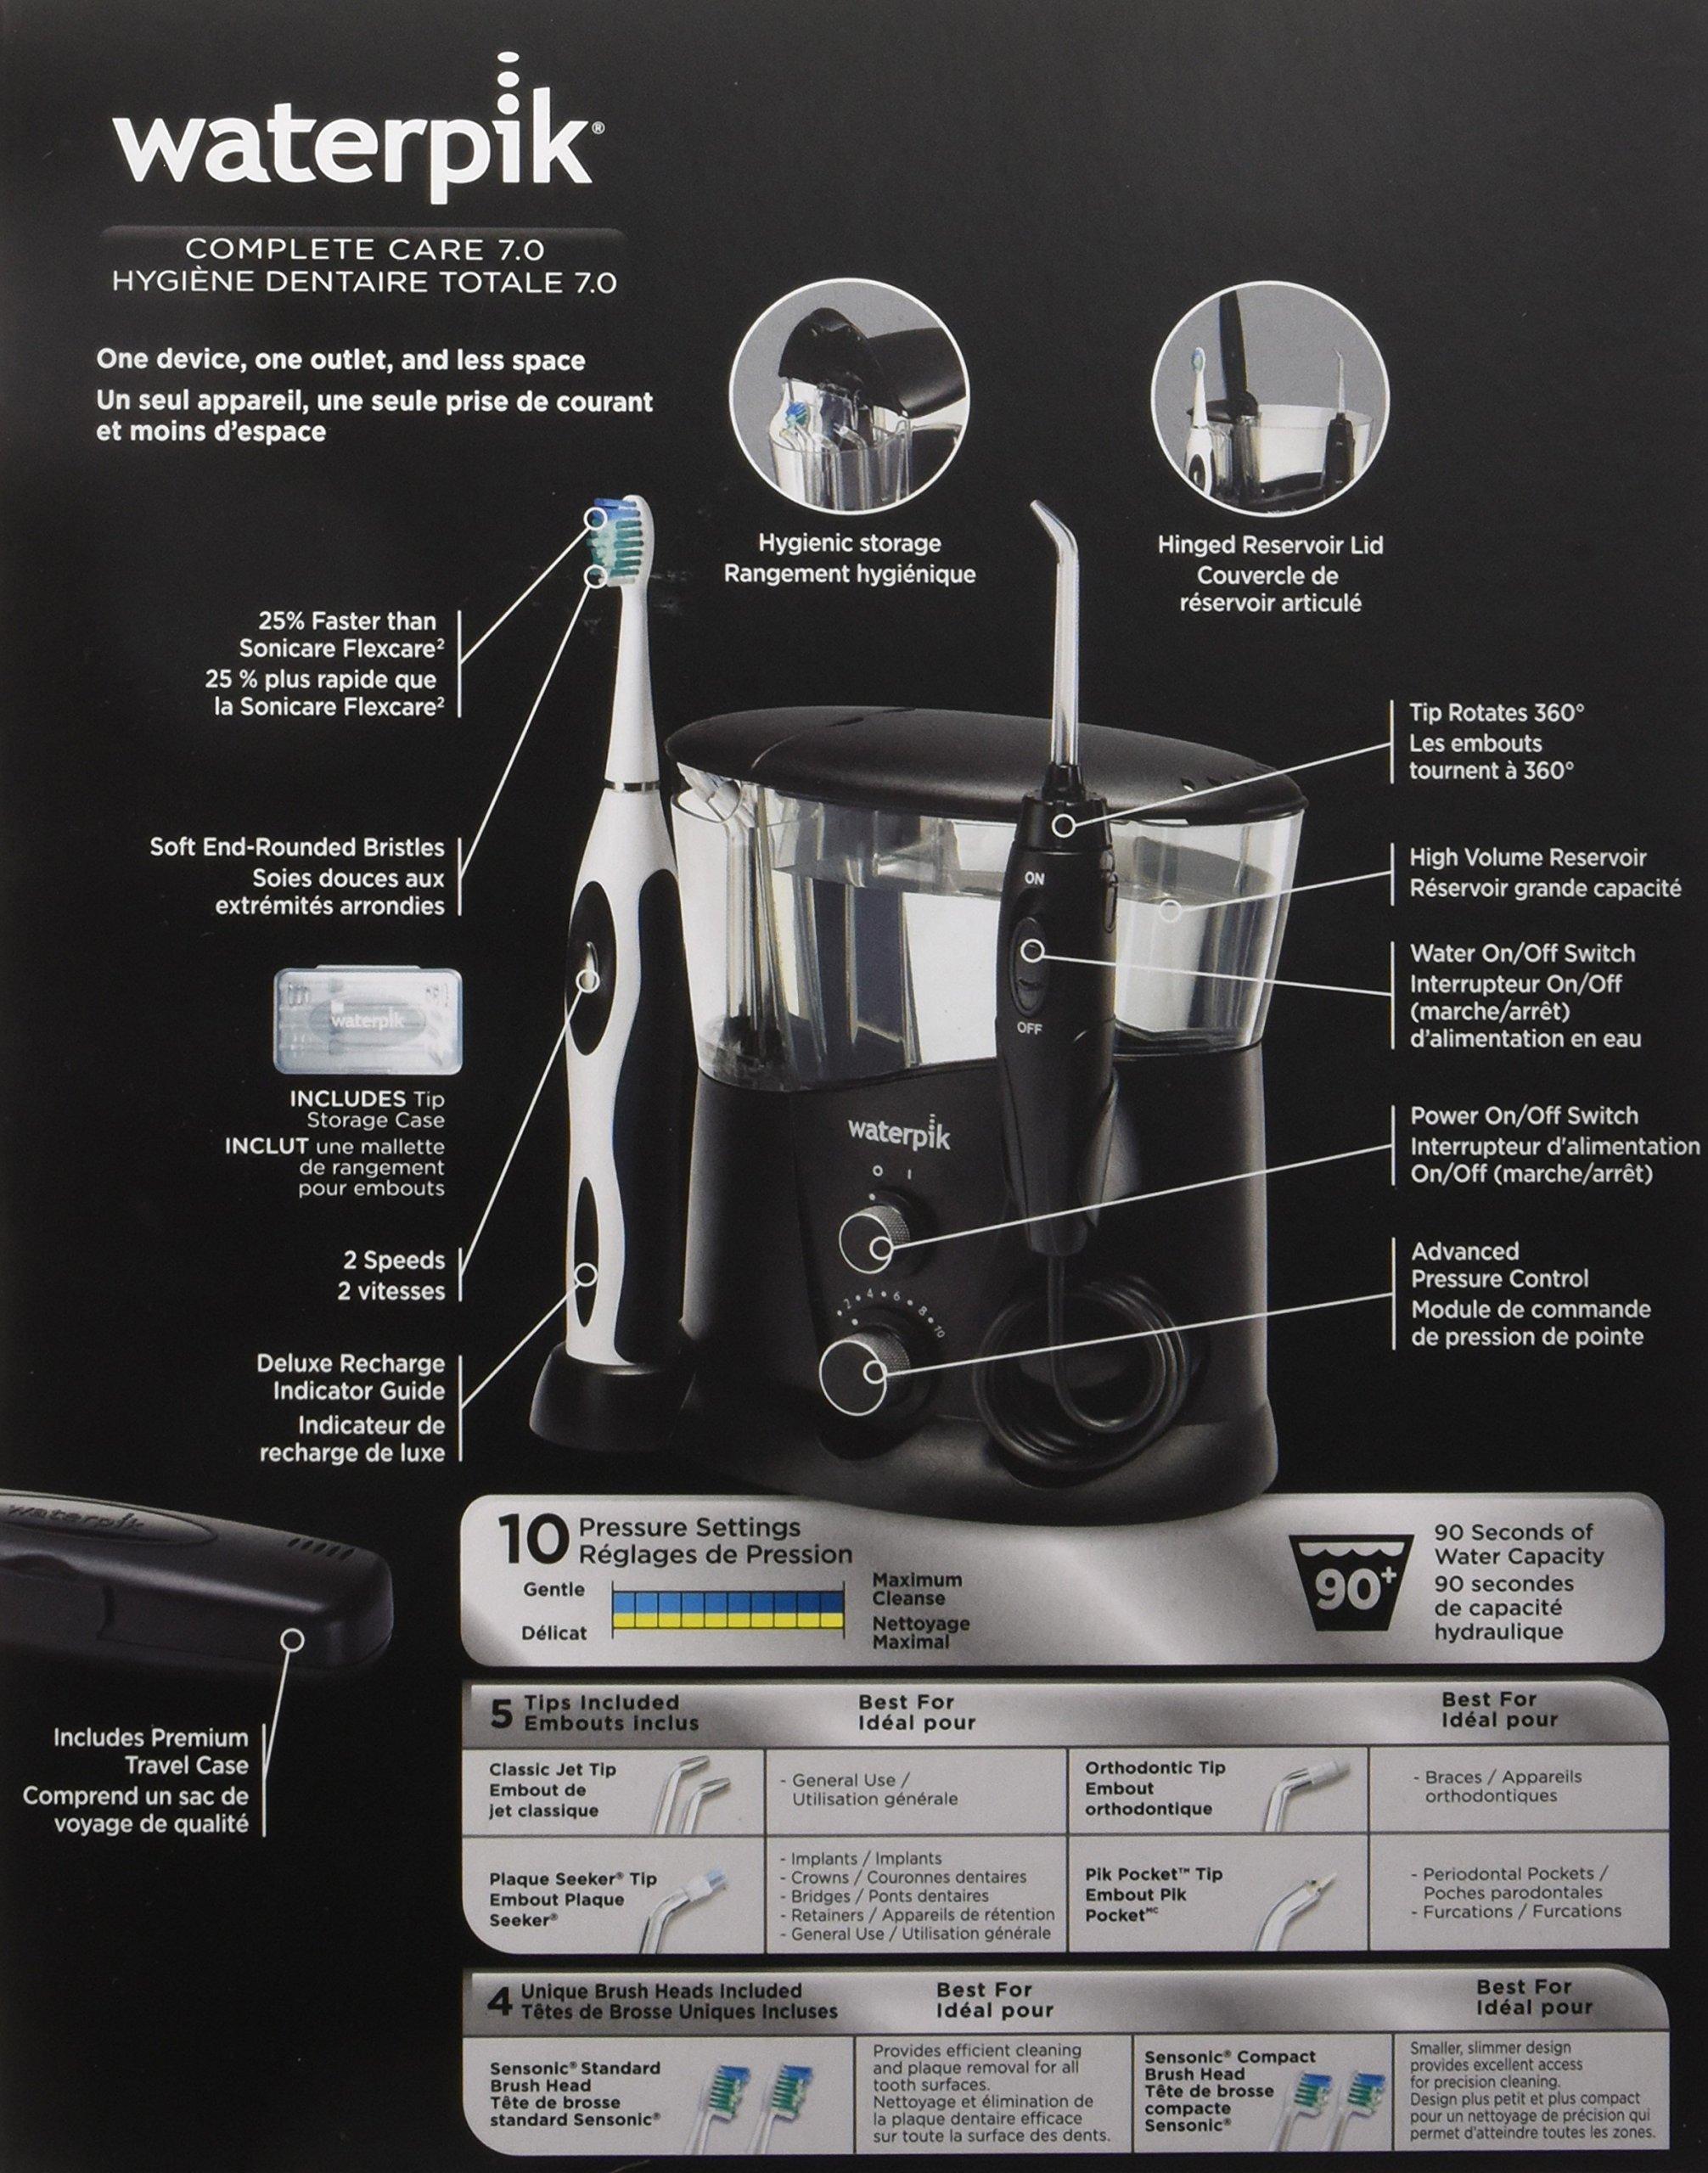 Waterpik WP-952 Complete Care 7.0 Water Flosser and Sonic Tooth Brush, Black by Waterpik (Image #21)